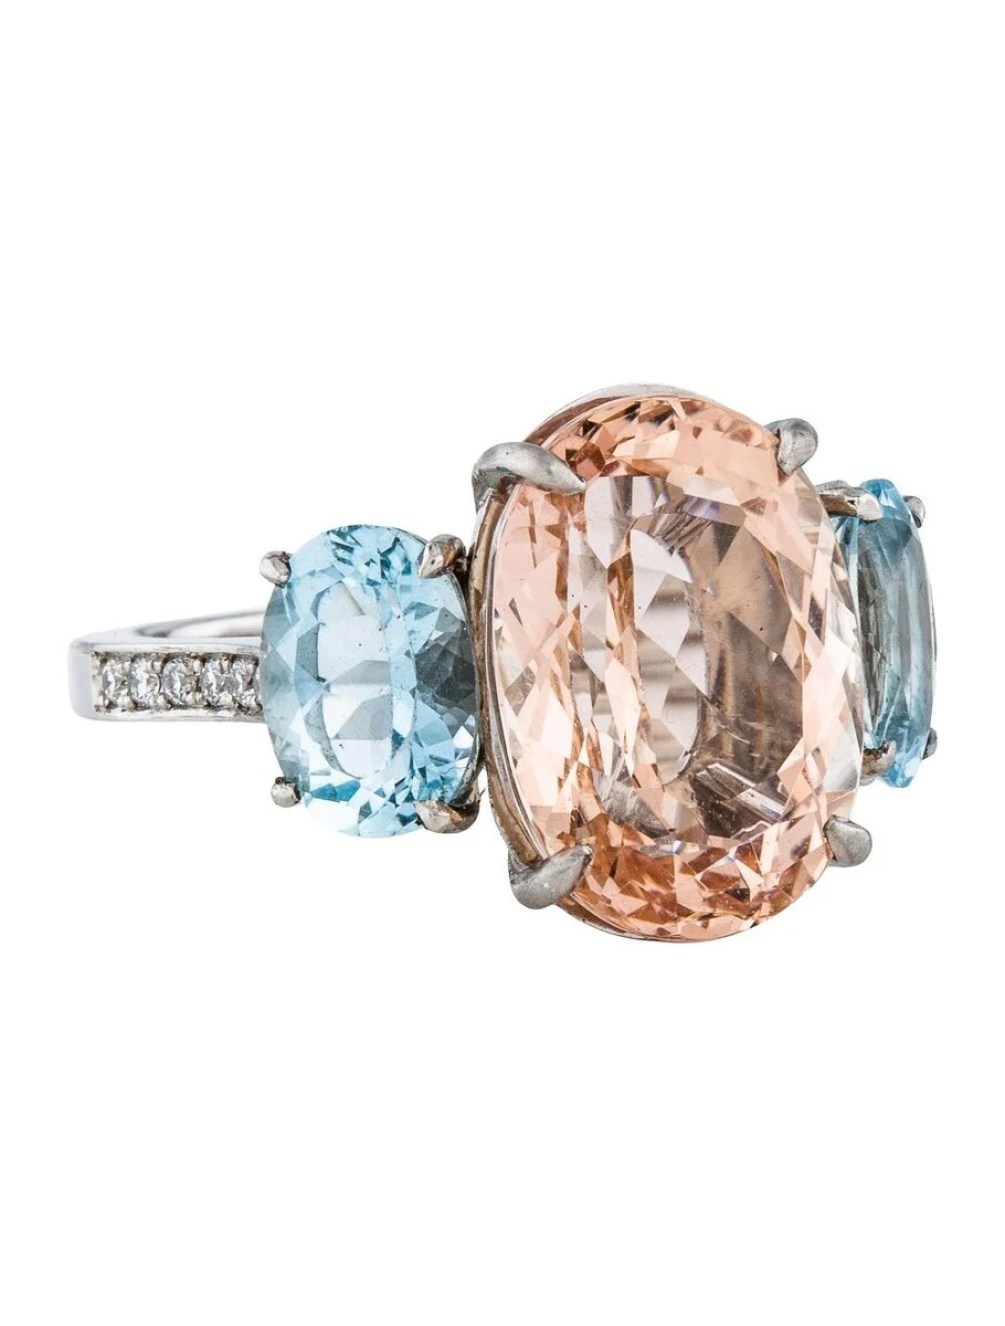 Morganite and Aquamarine Ring ($2,200)